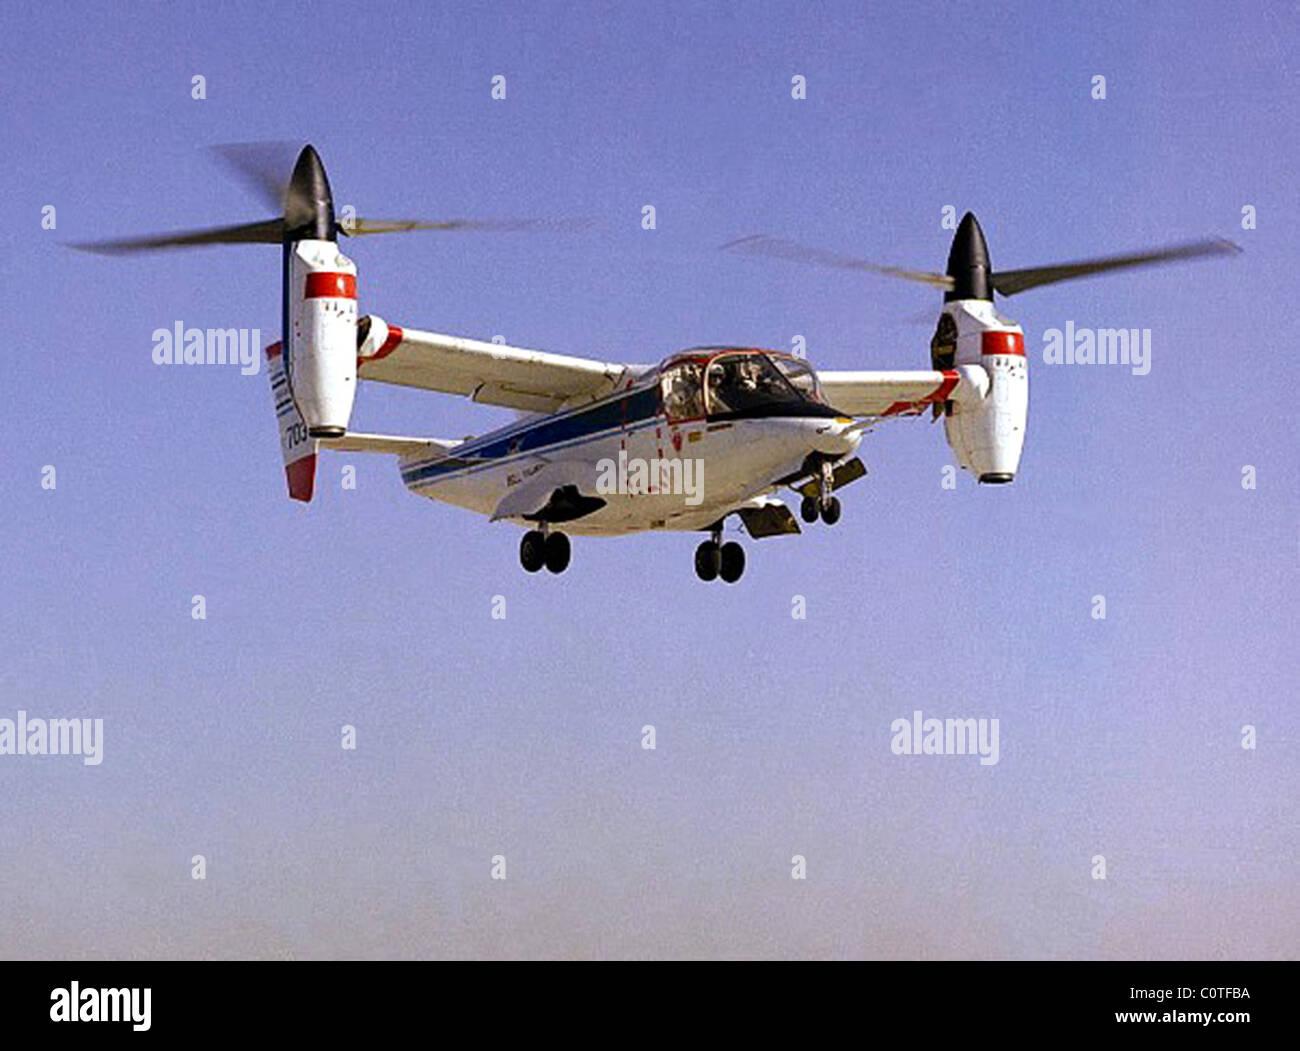 NASA-Army-Bell XV-15 avions de recherche rotor basculant Photo Stock